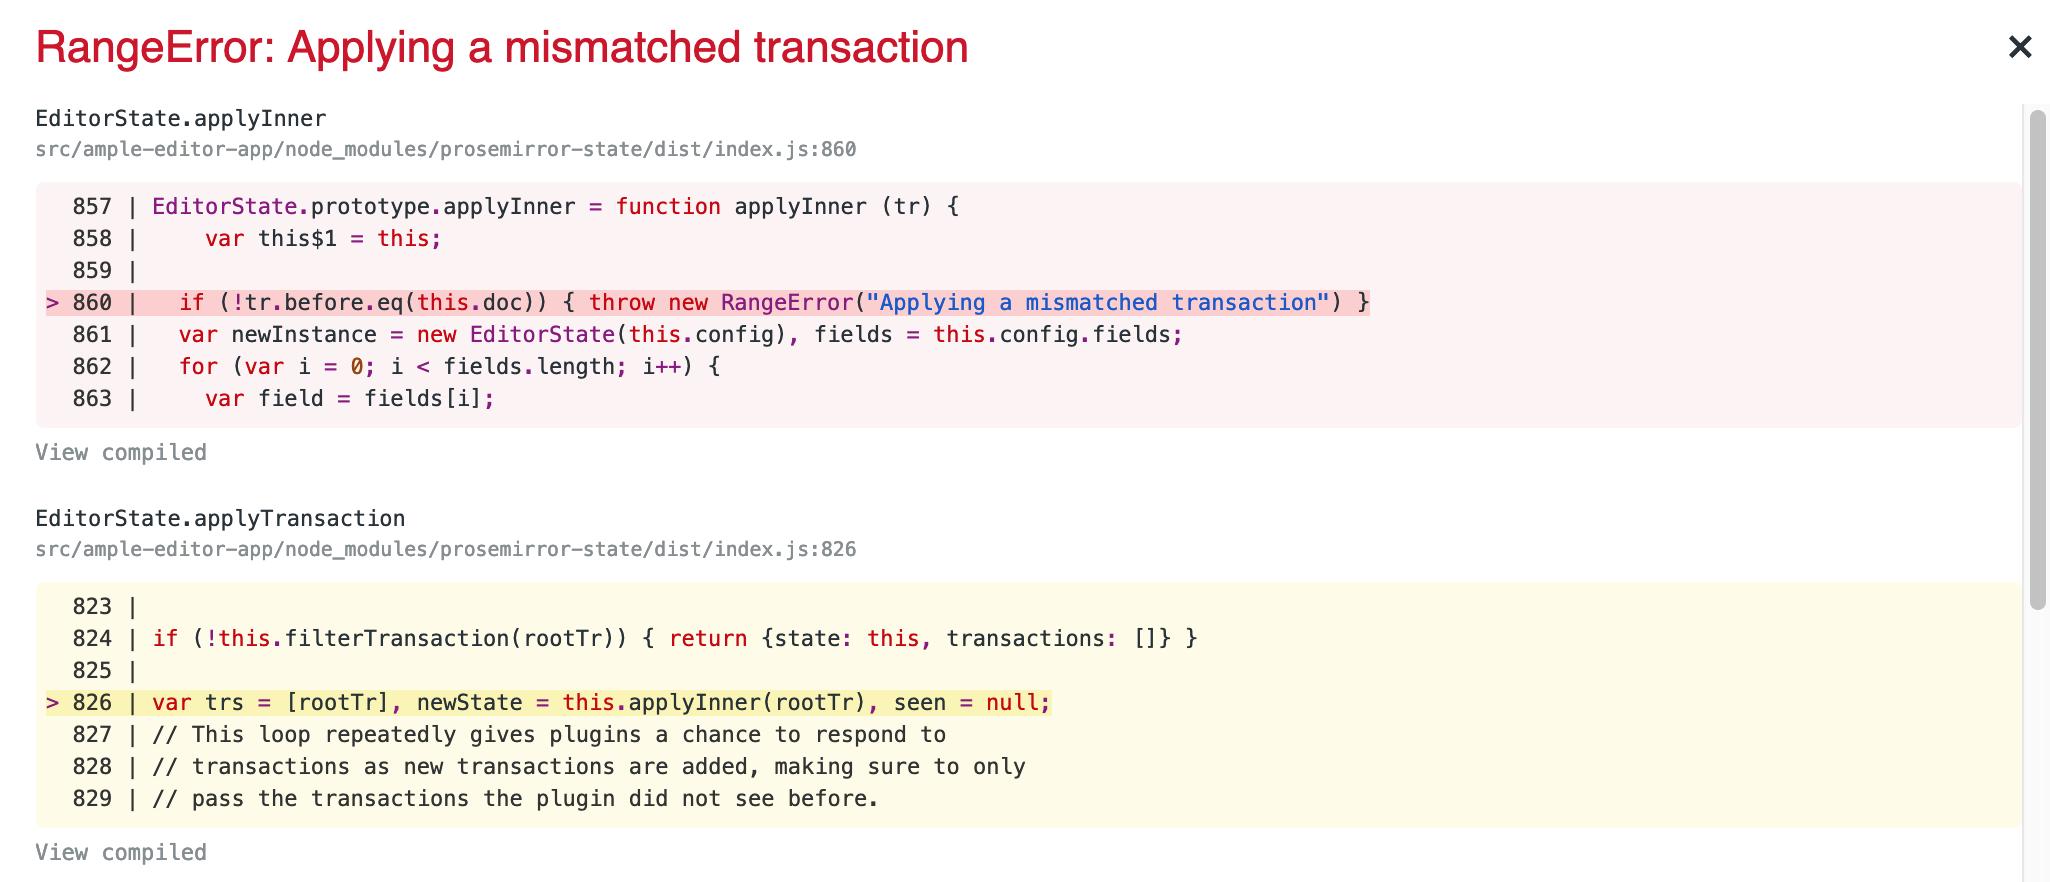 RangeError: Applying a mismatched transaction - discuss